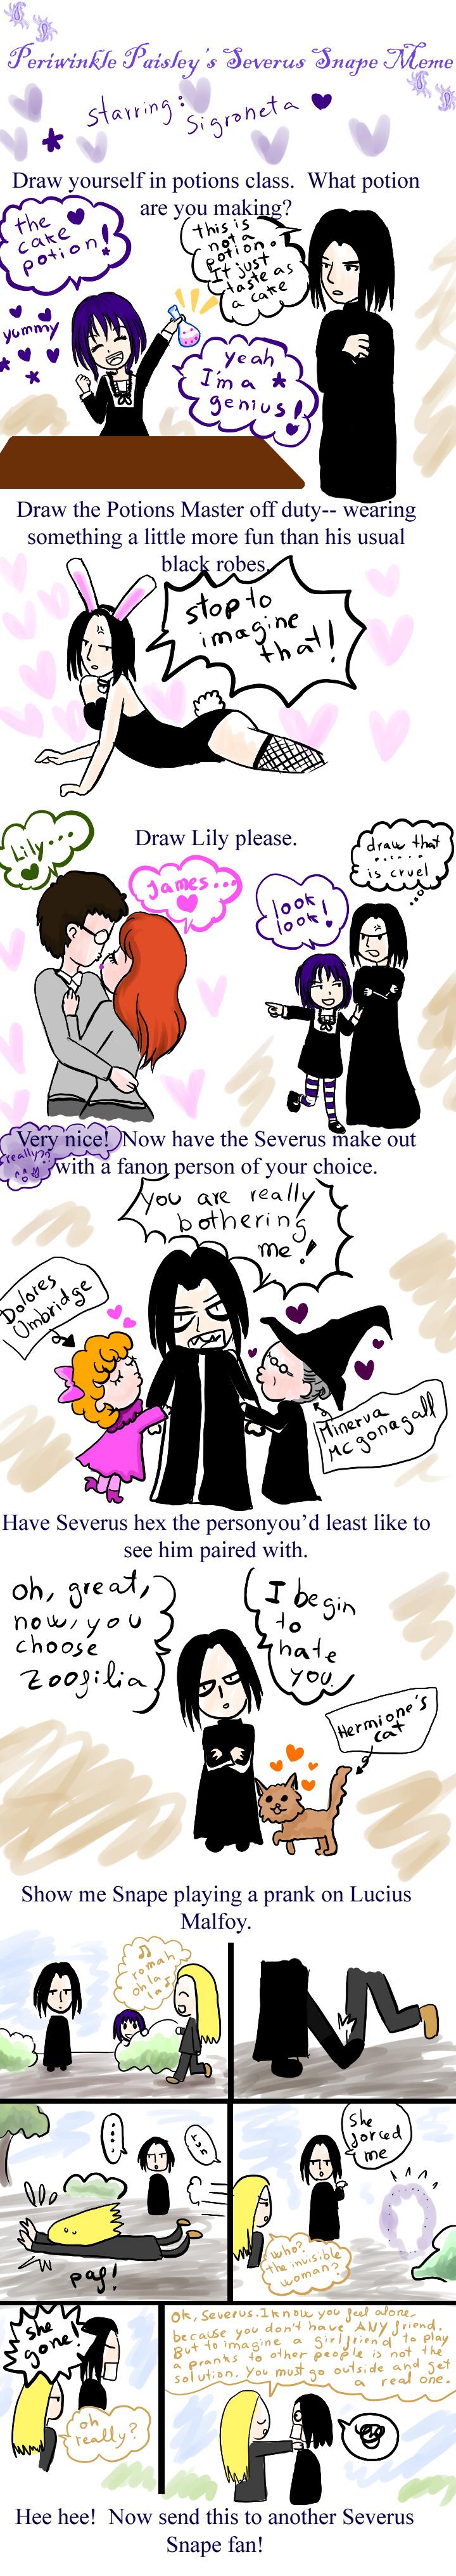 Severus Snape meme by sigroneta